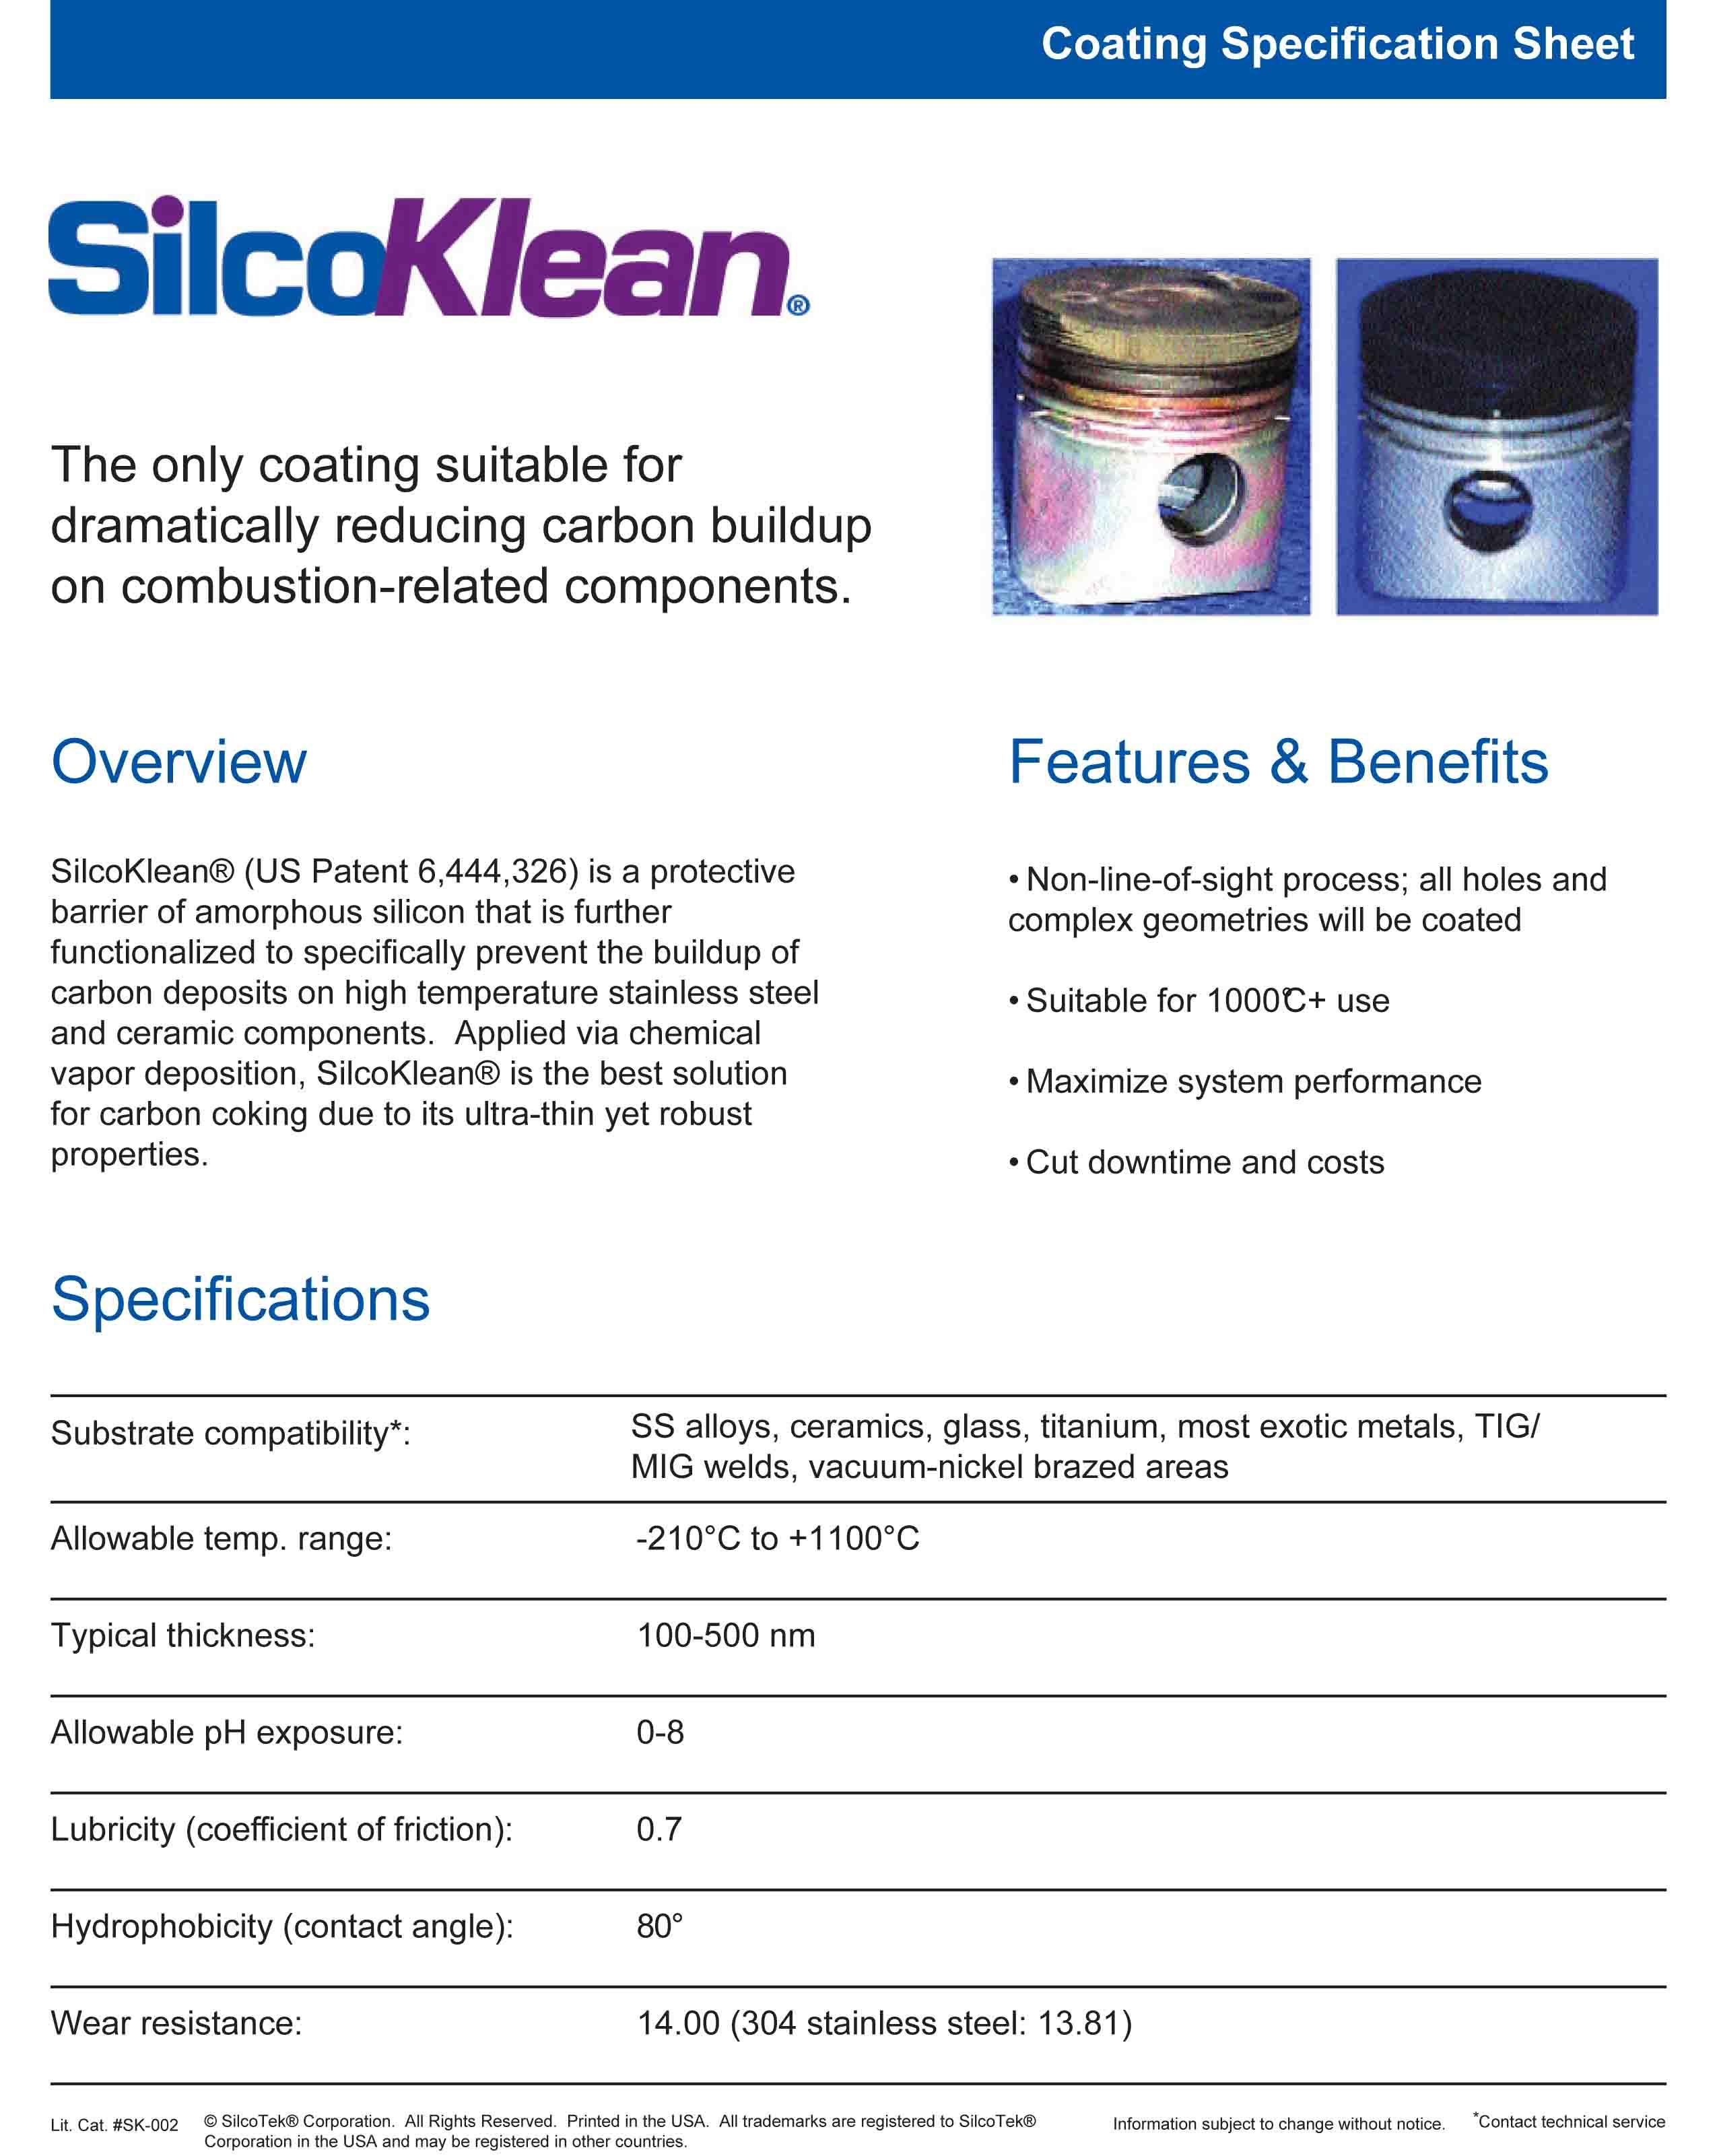 silcoklean-coating-specification